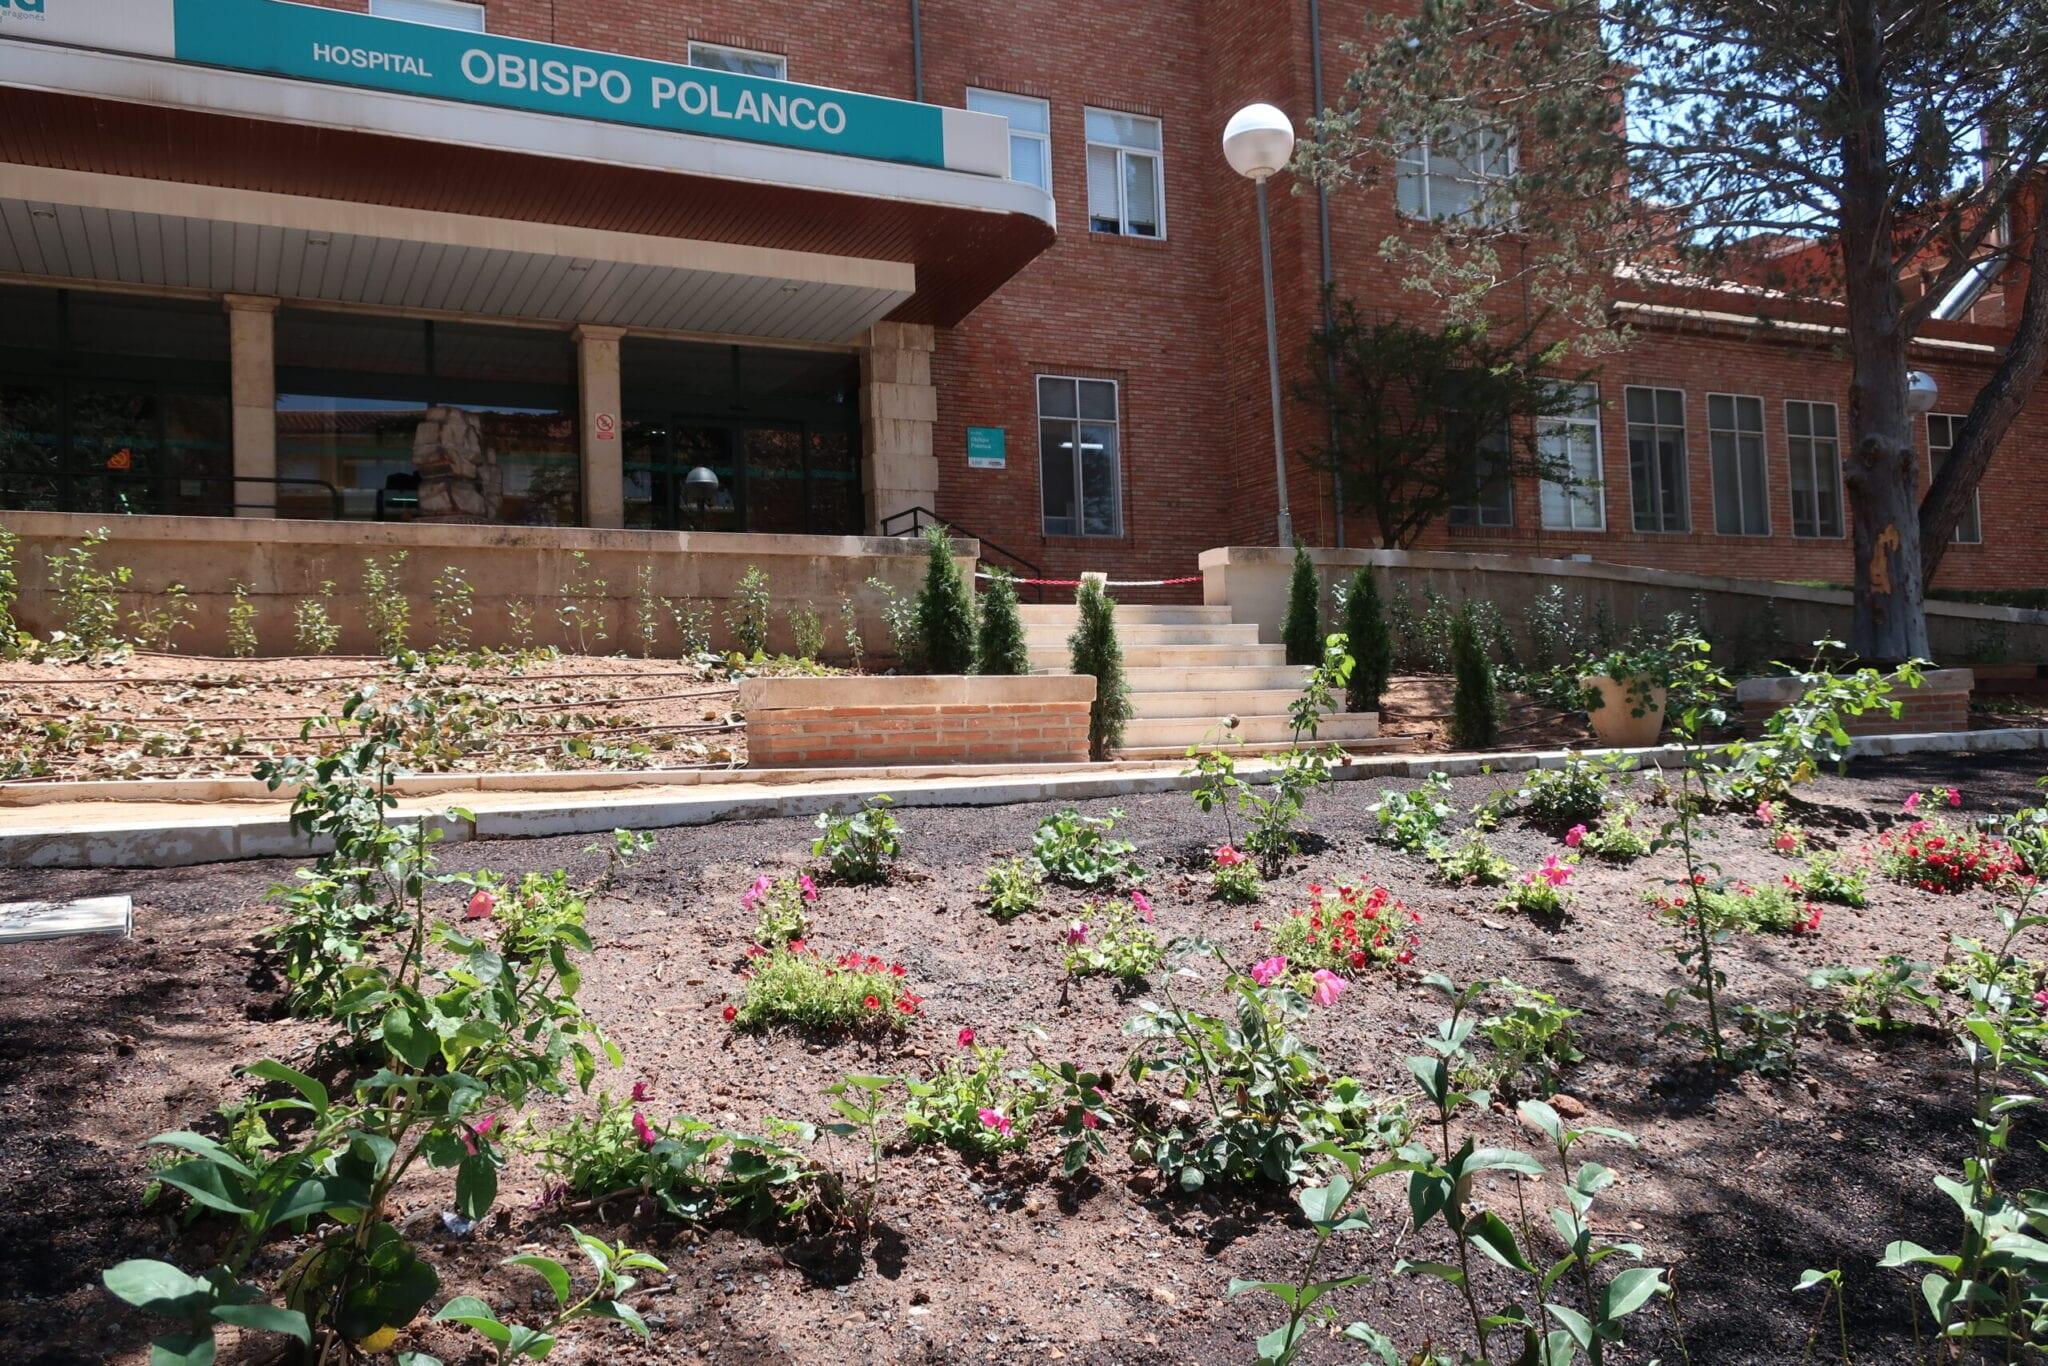 ATADI Empleo asume el servicio de quiosco del Hospital Obispo Polanco